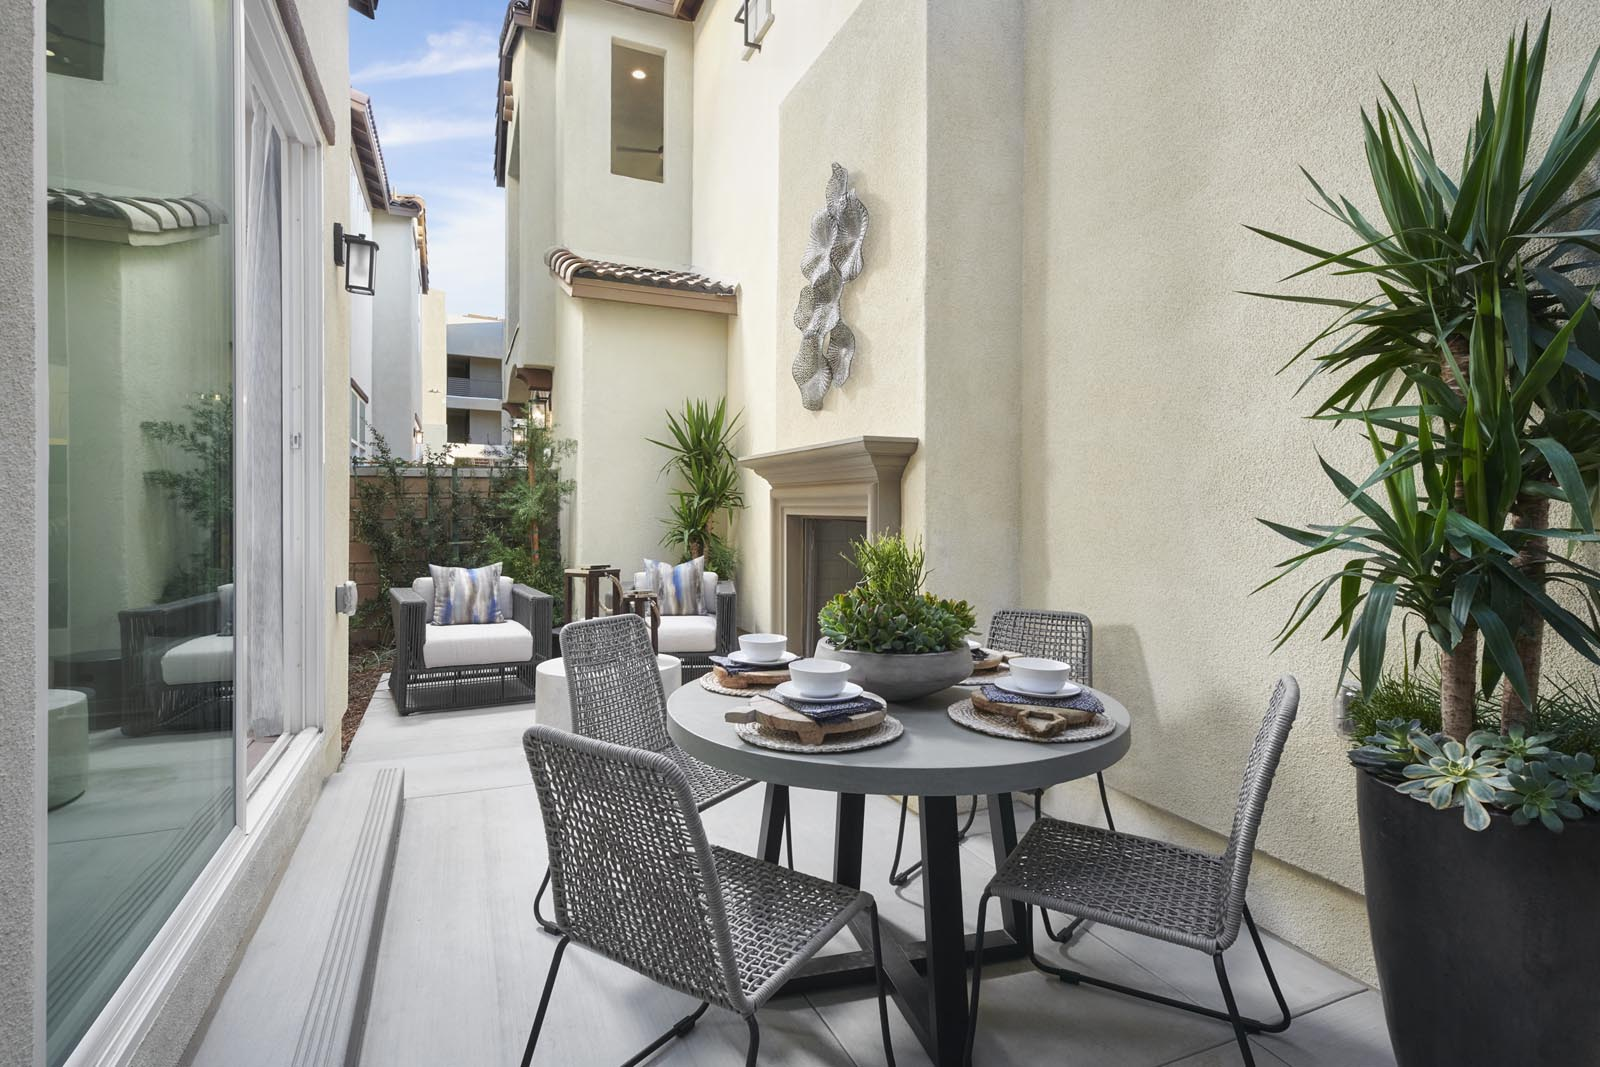 Patio | Residence 3 | Lumin | New Homes in Rancho Cucamonga, CA | Van Daele Homes